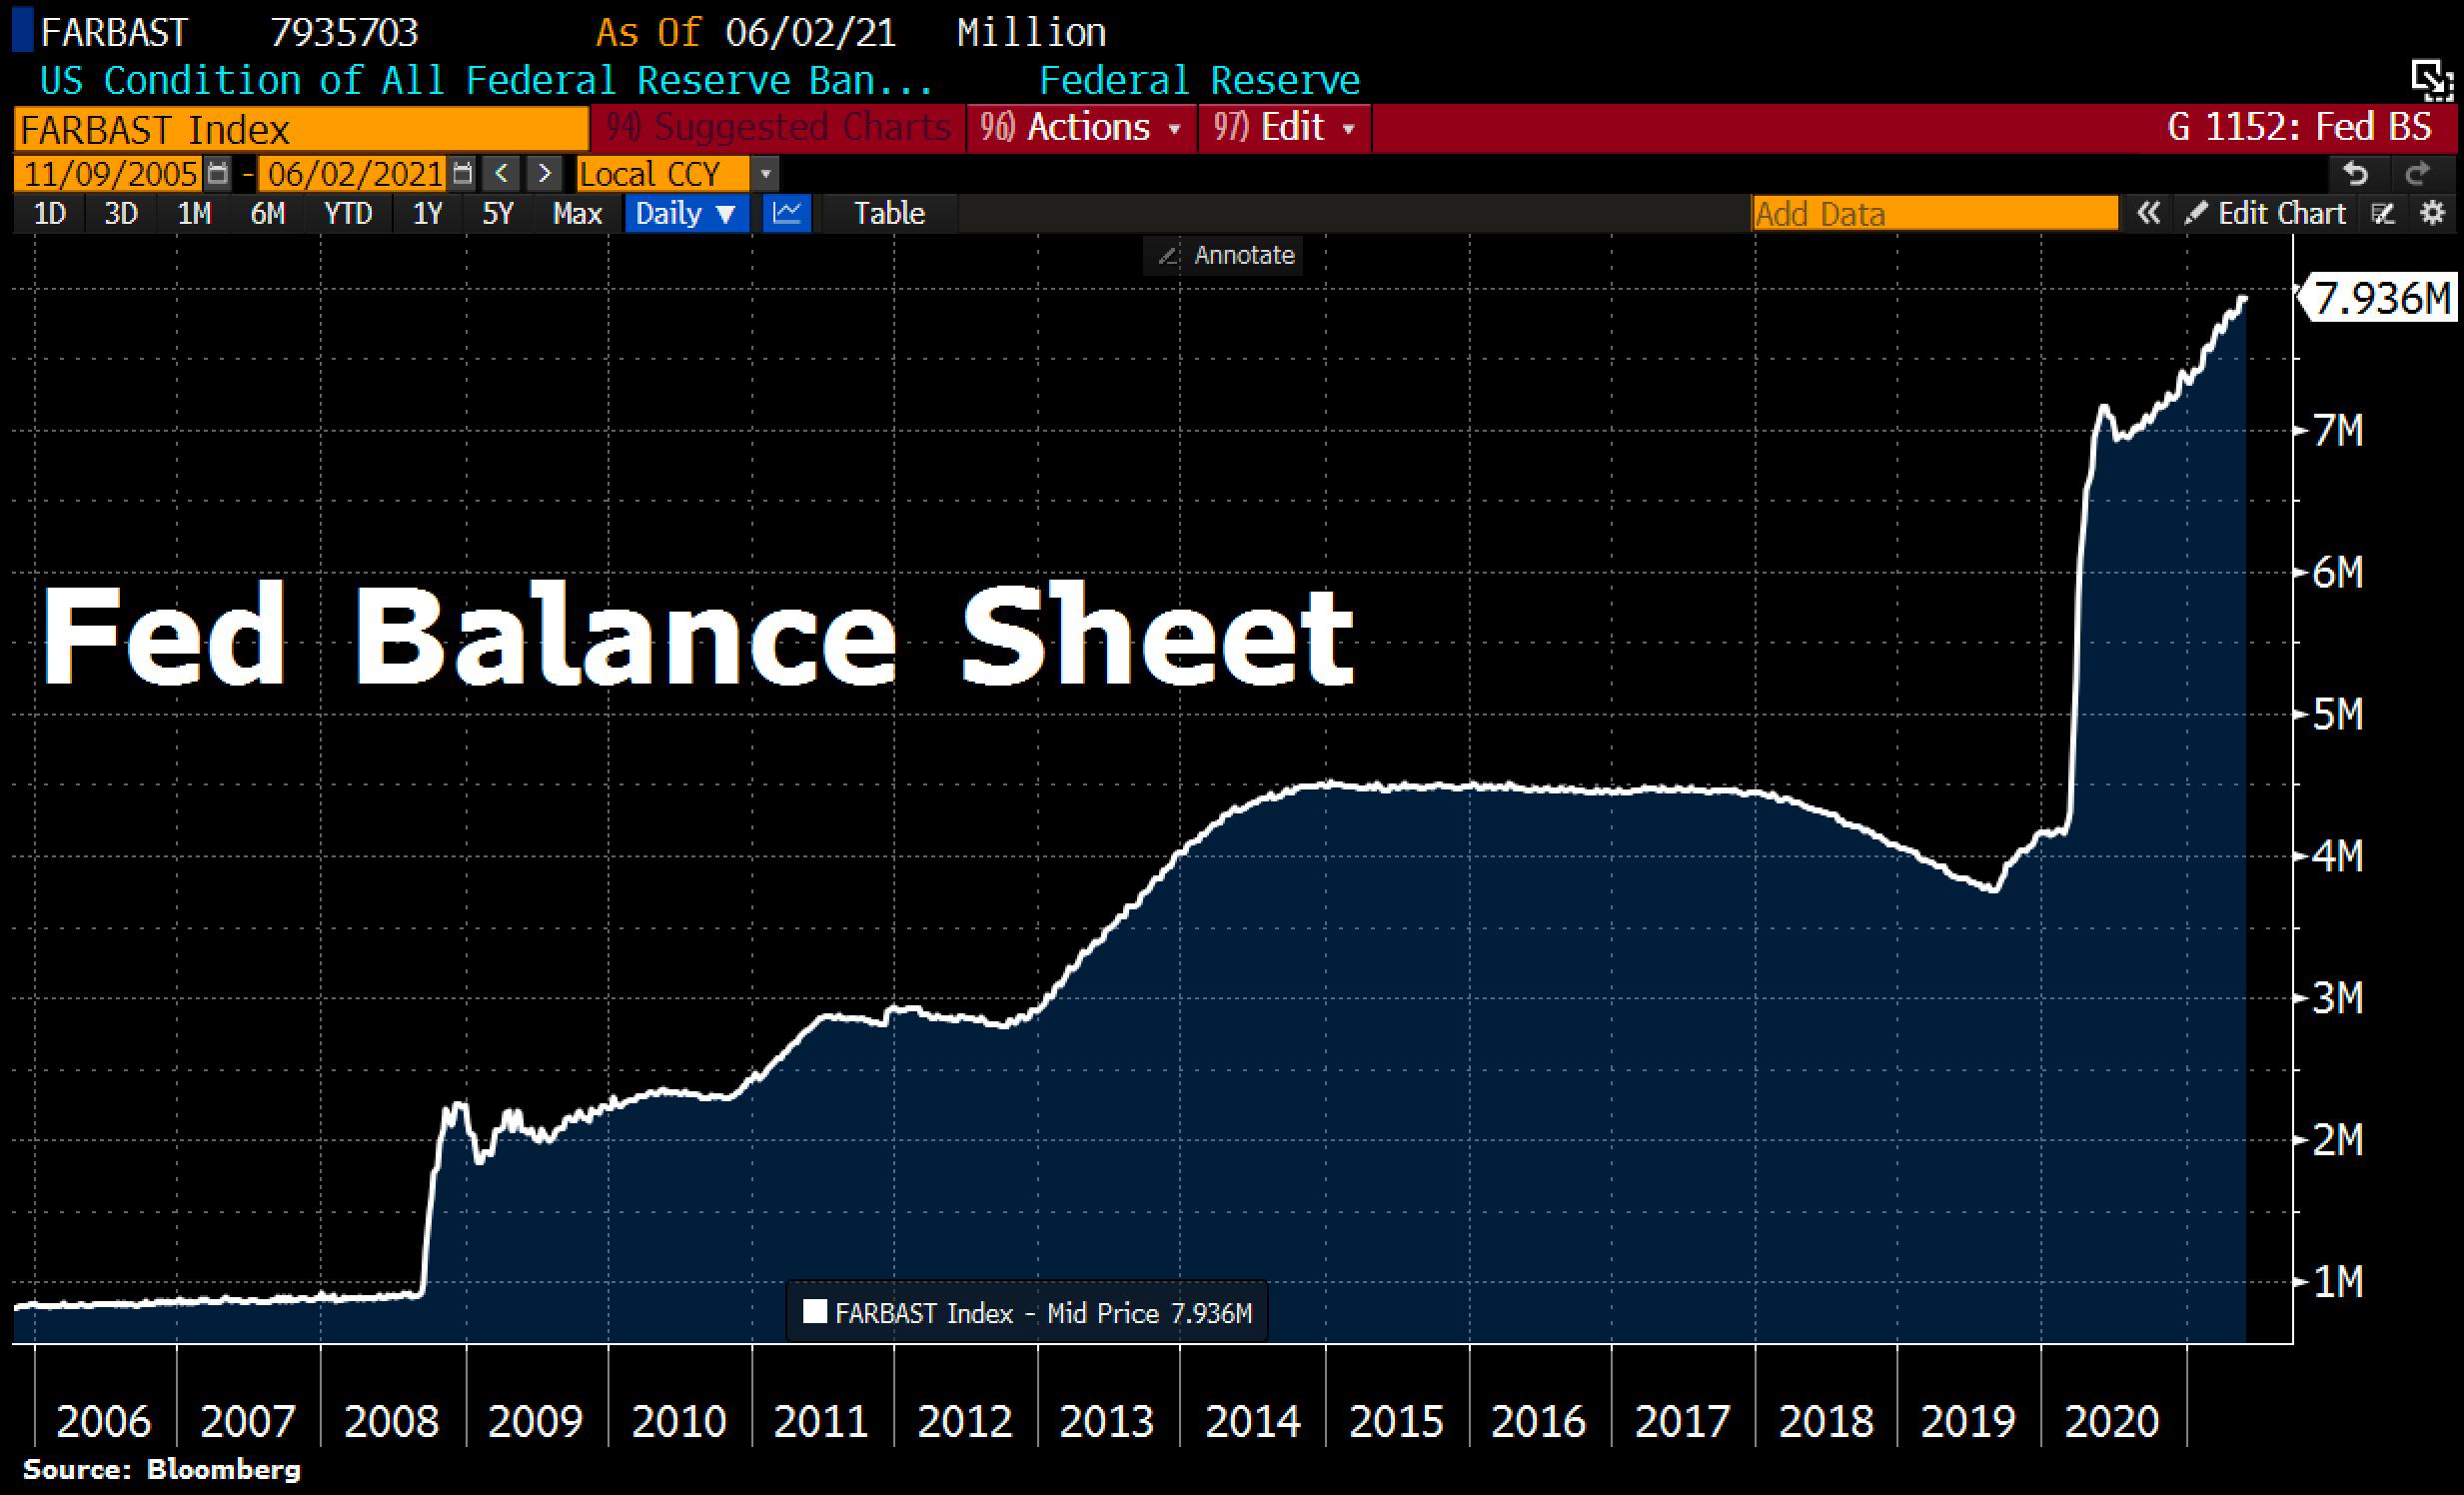 FED Balance Sheet. © Holger Zschaepitz via Twitter @Schuldensuehner, June 3rd, 2021.